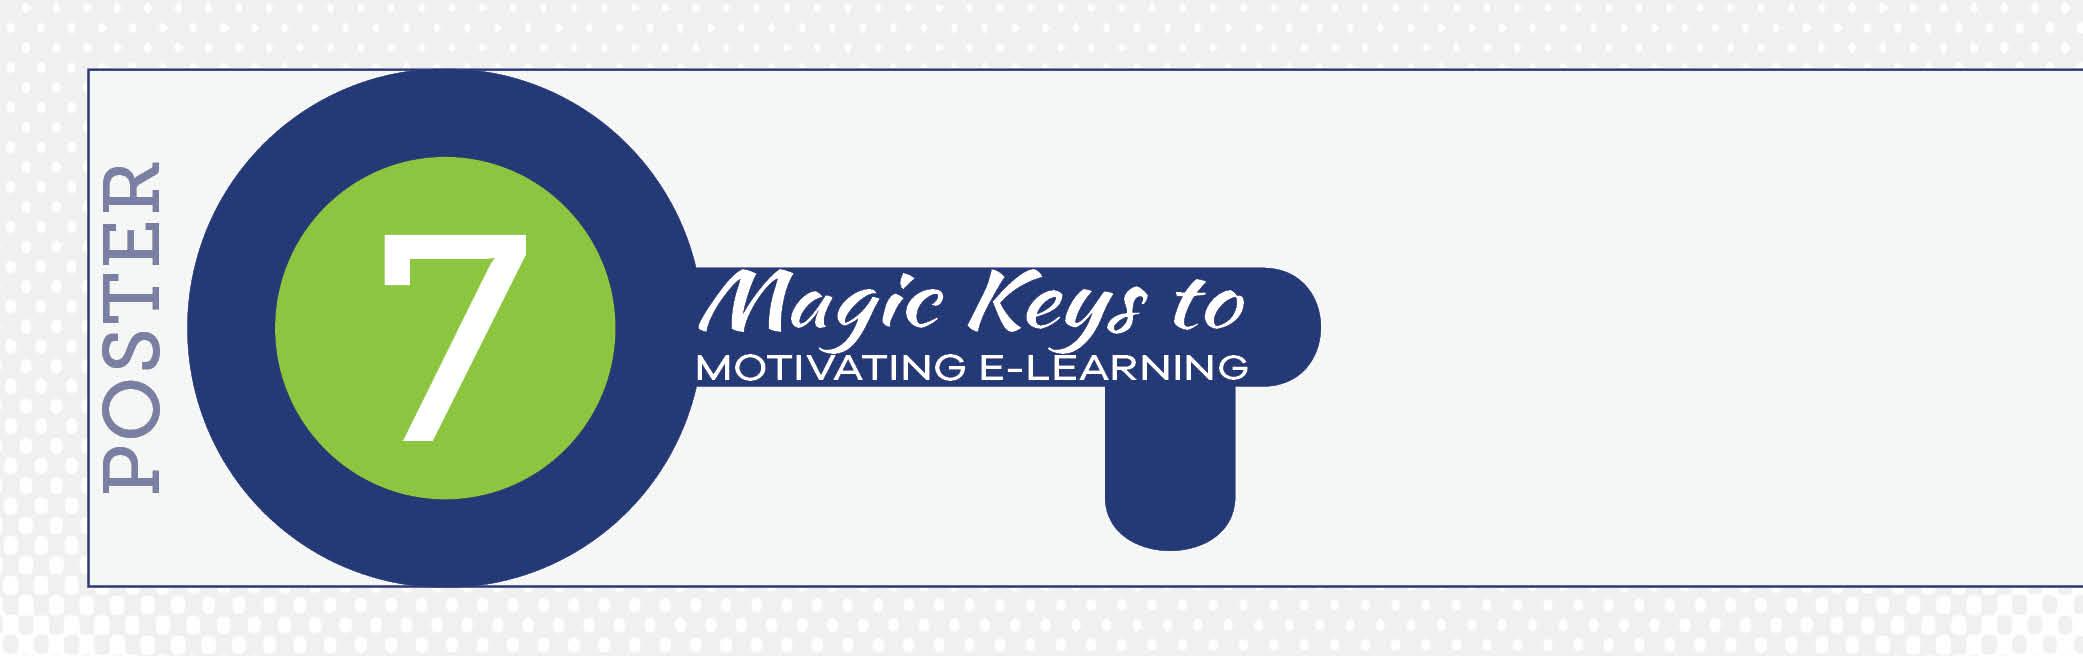 7 Magic Keys to Motivating ELearning